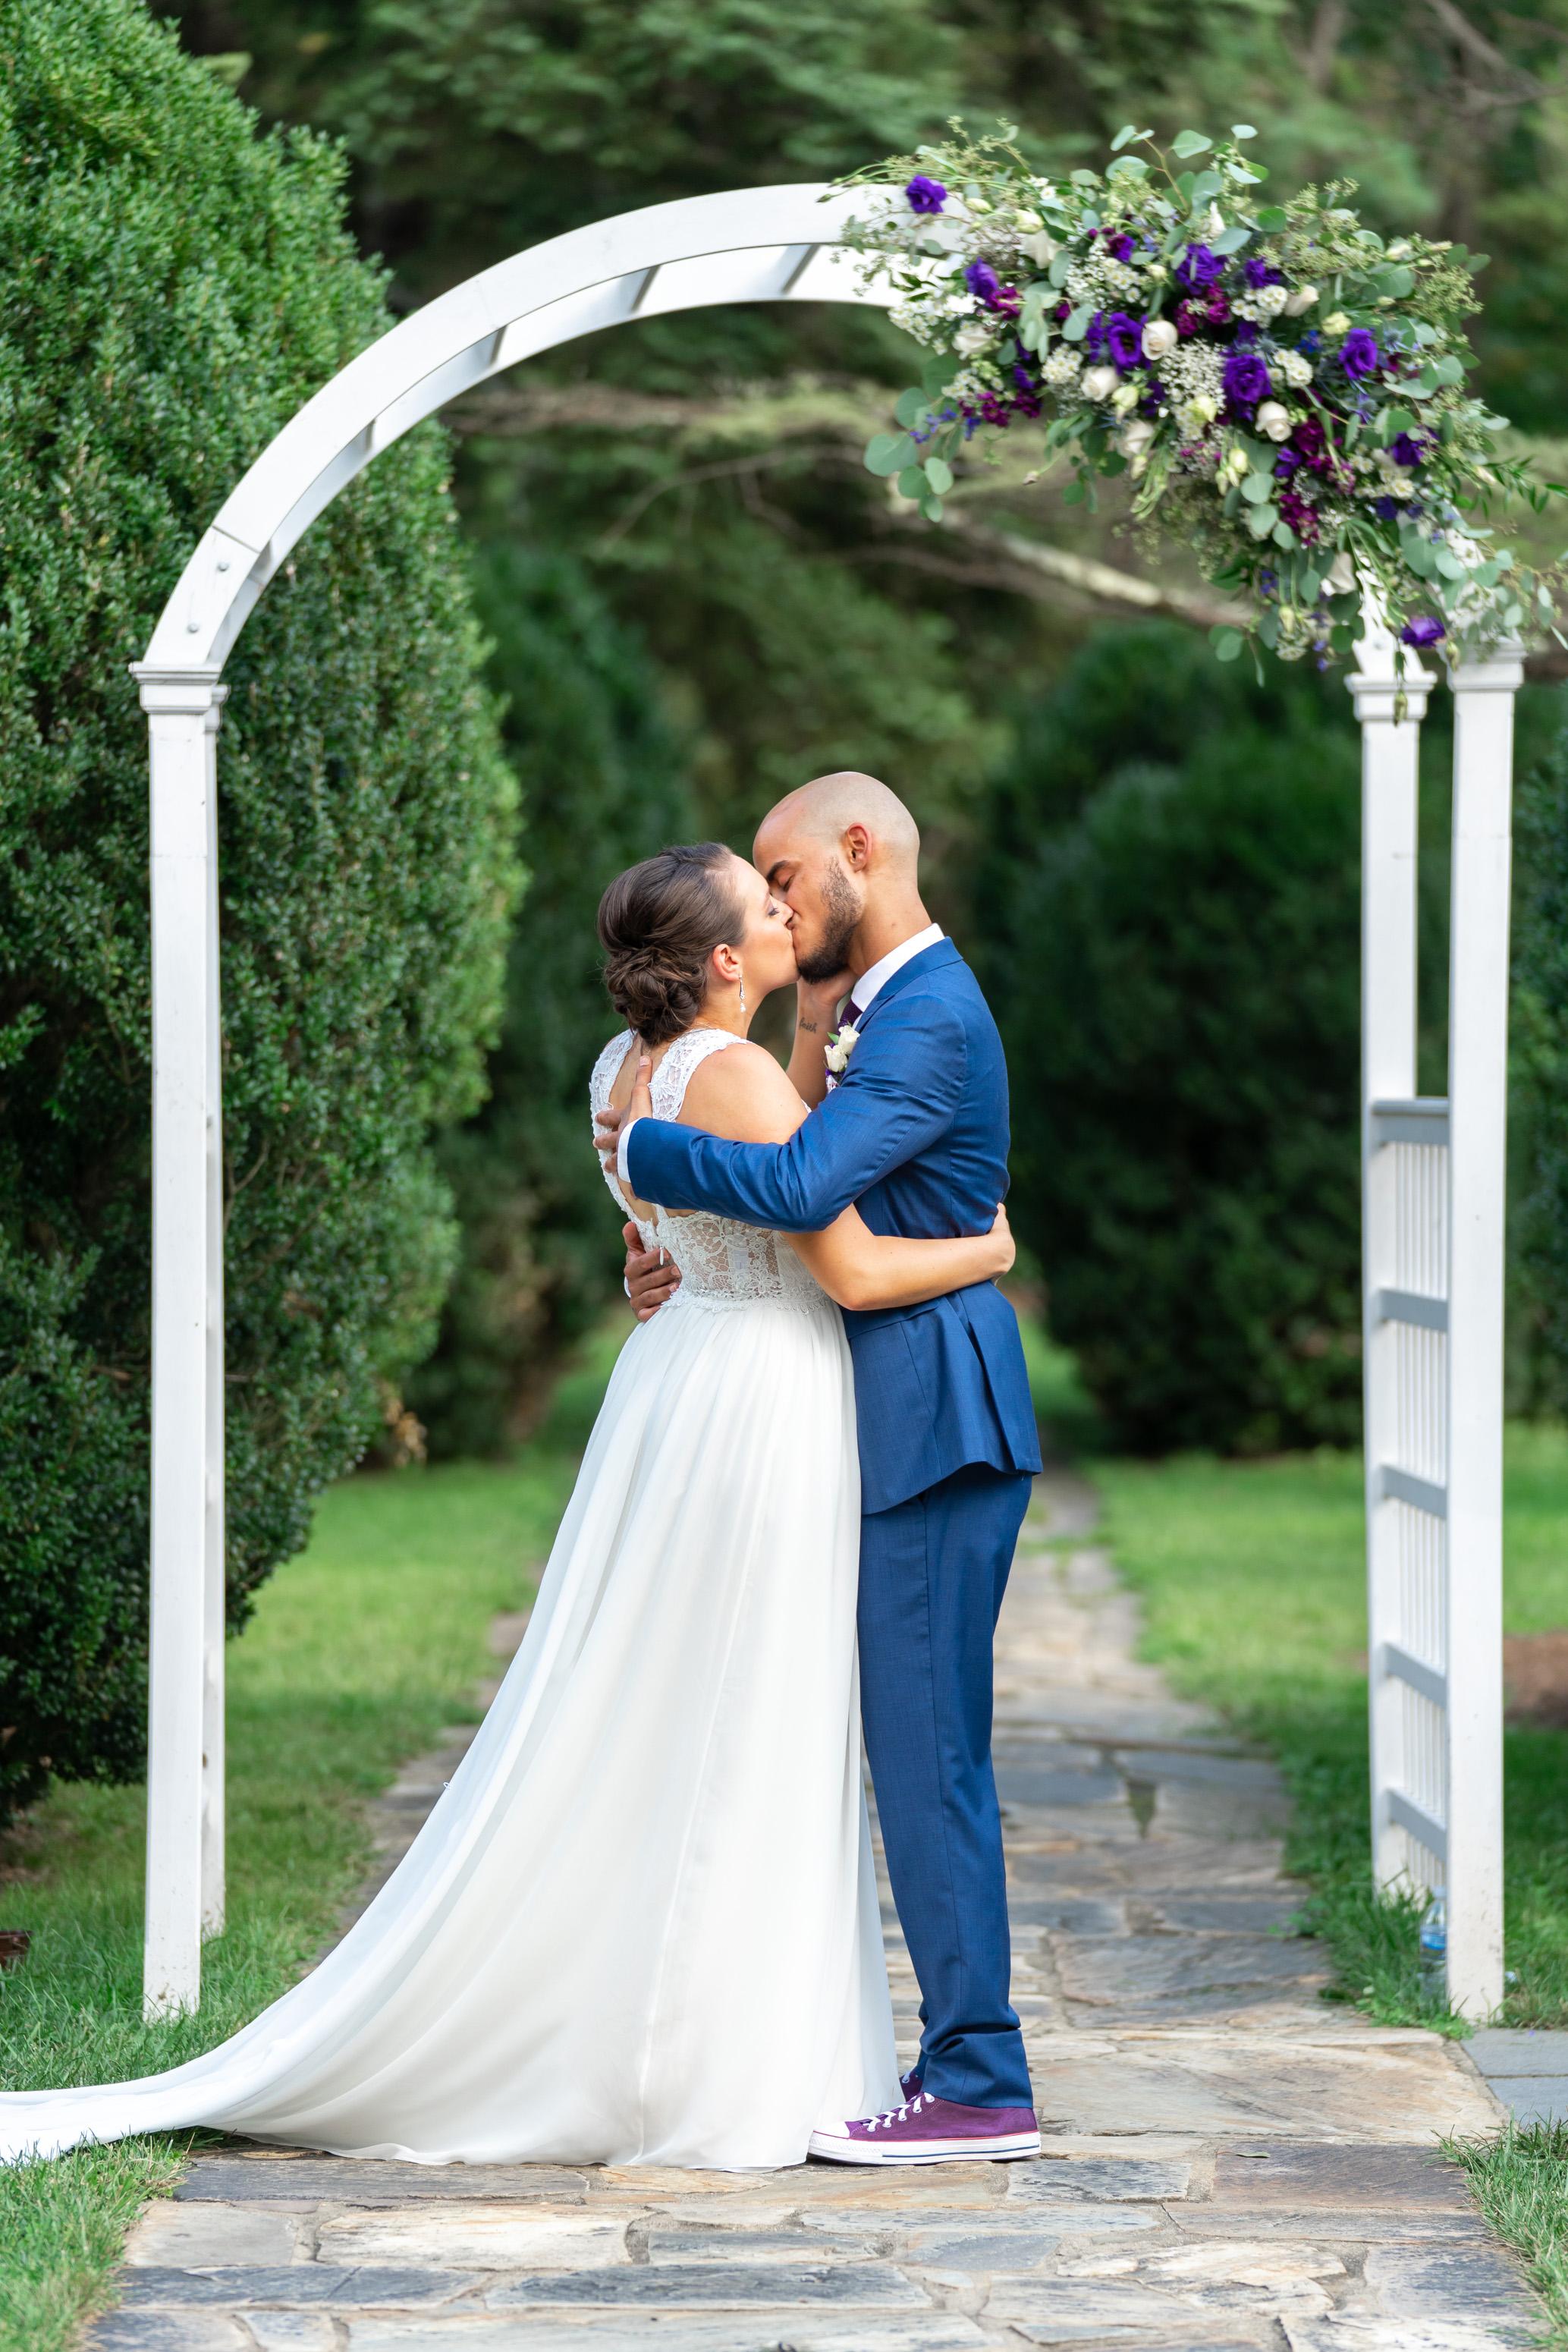 wedding-at-rust-manor-house-garden-jessica-nazarova